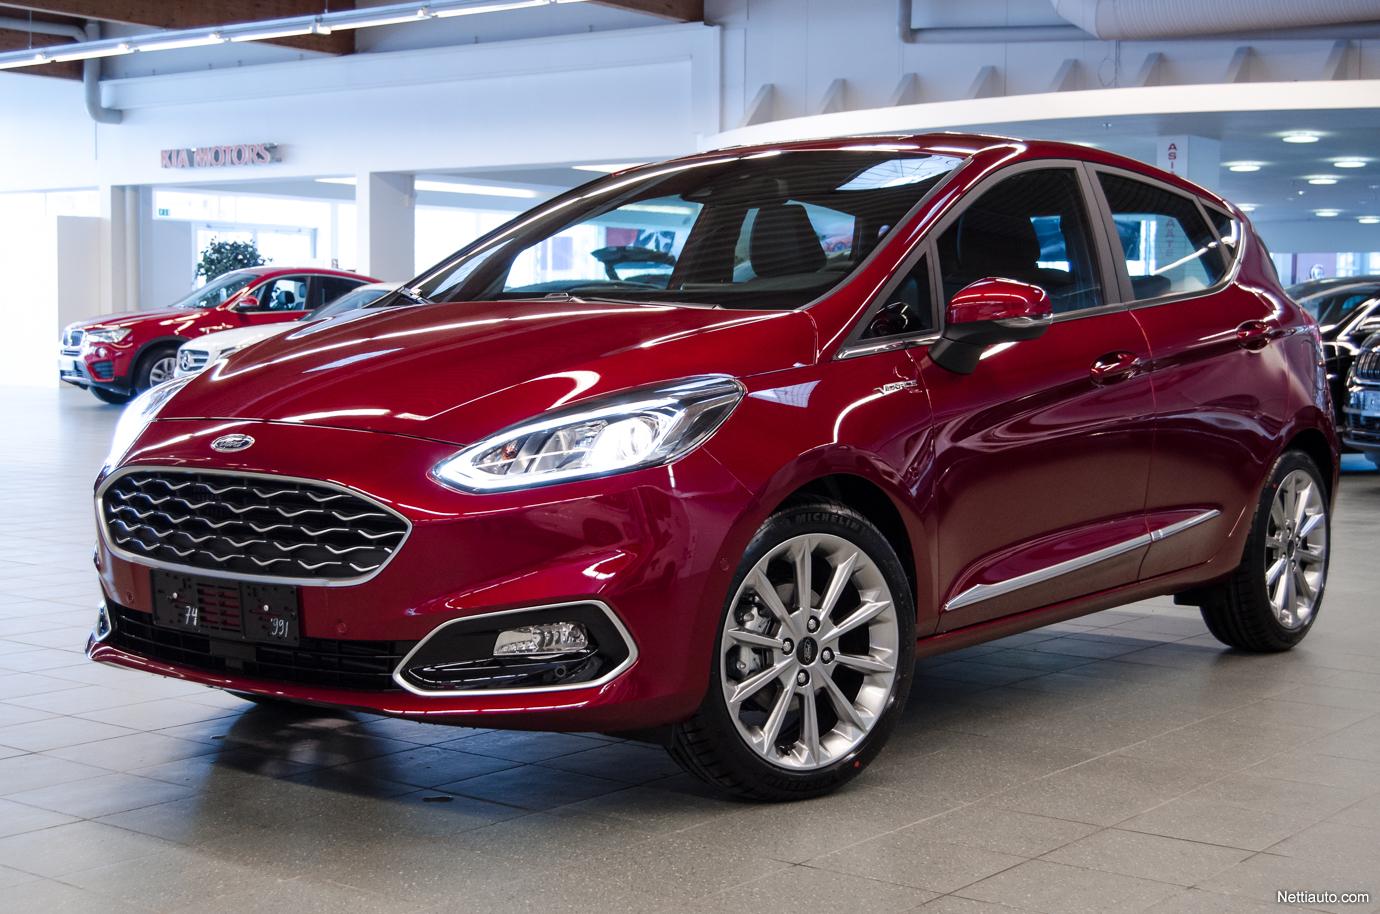 Ford Fiesta Vignale >> Ford Fiesta 1 0 Ecoboost 100hv A6 Vignale 5d Takuu 5v